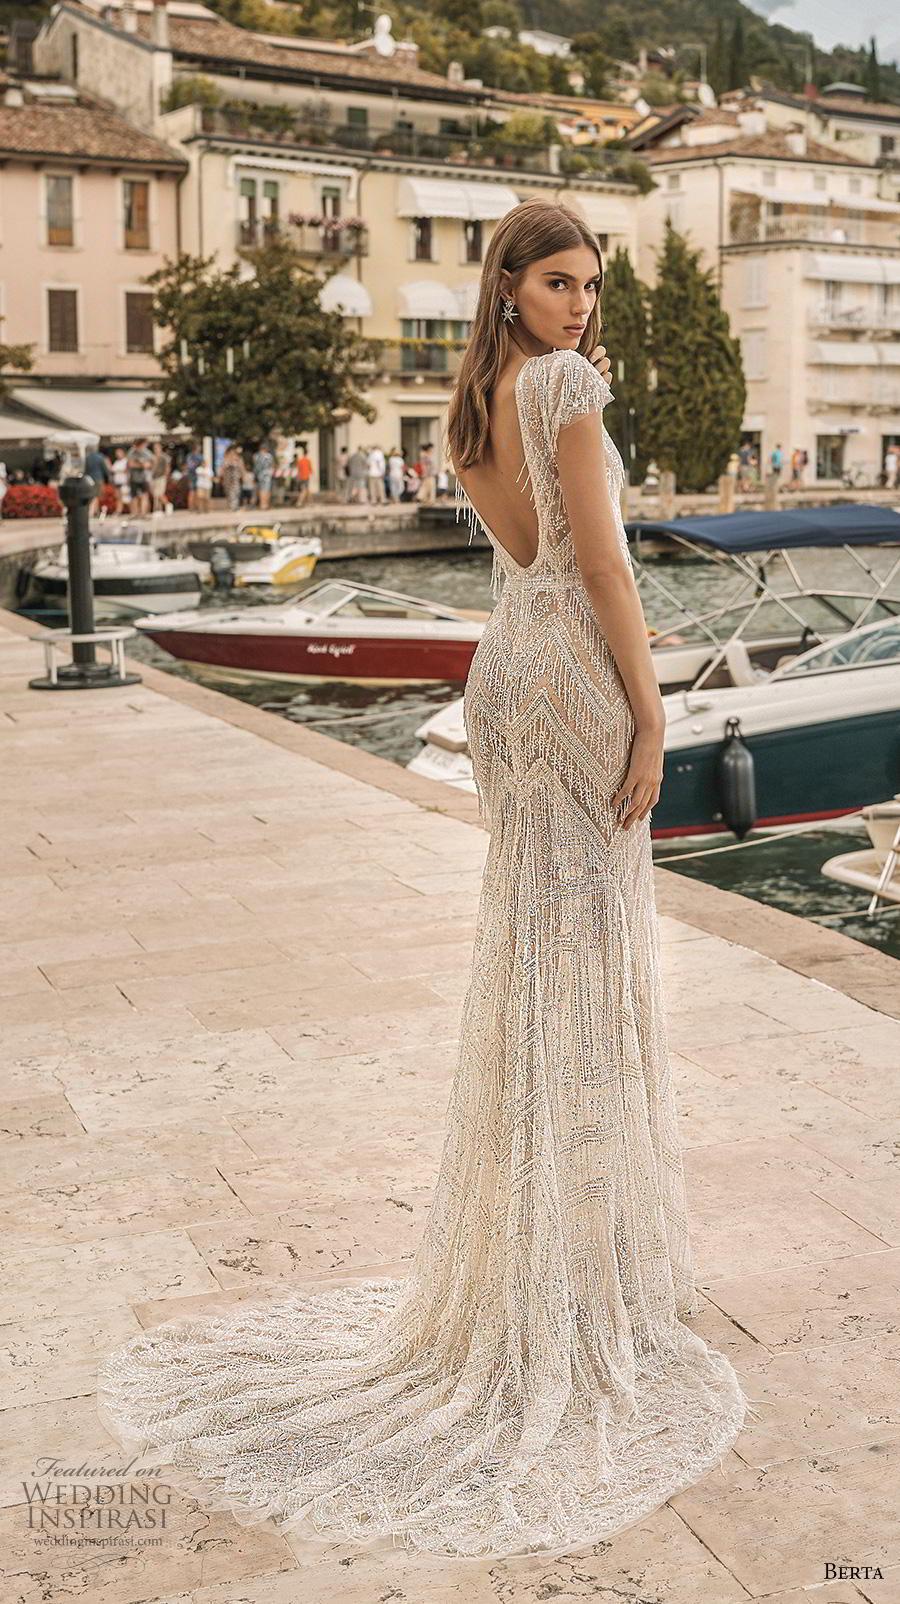 berta 2019 privee bridal cap sleeves deep v neck full embellishment glitzy elegant fit and flare wedding dress backless v back medium train (10) bv